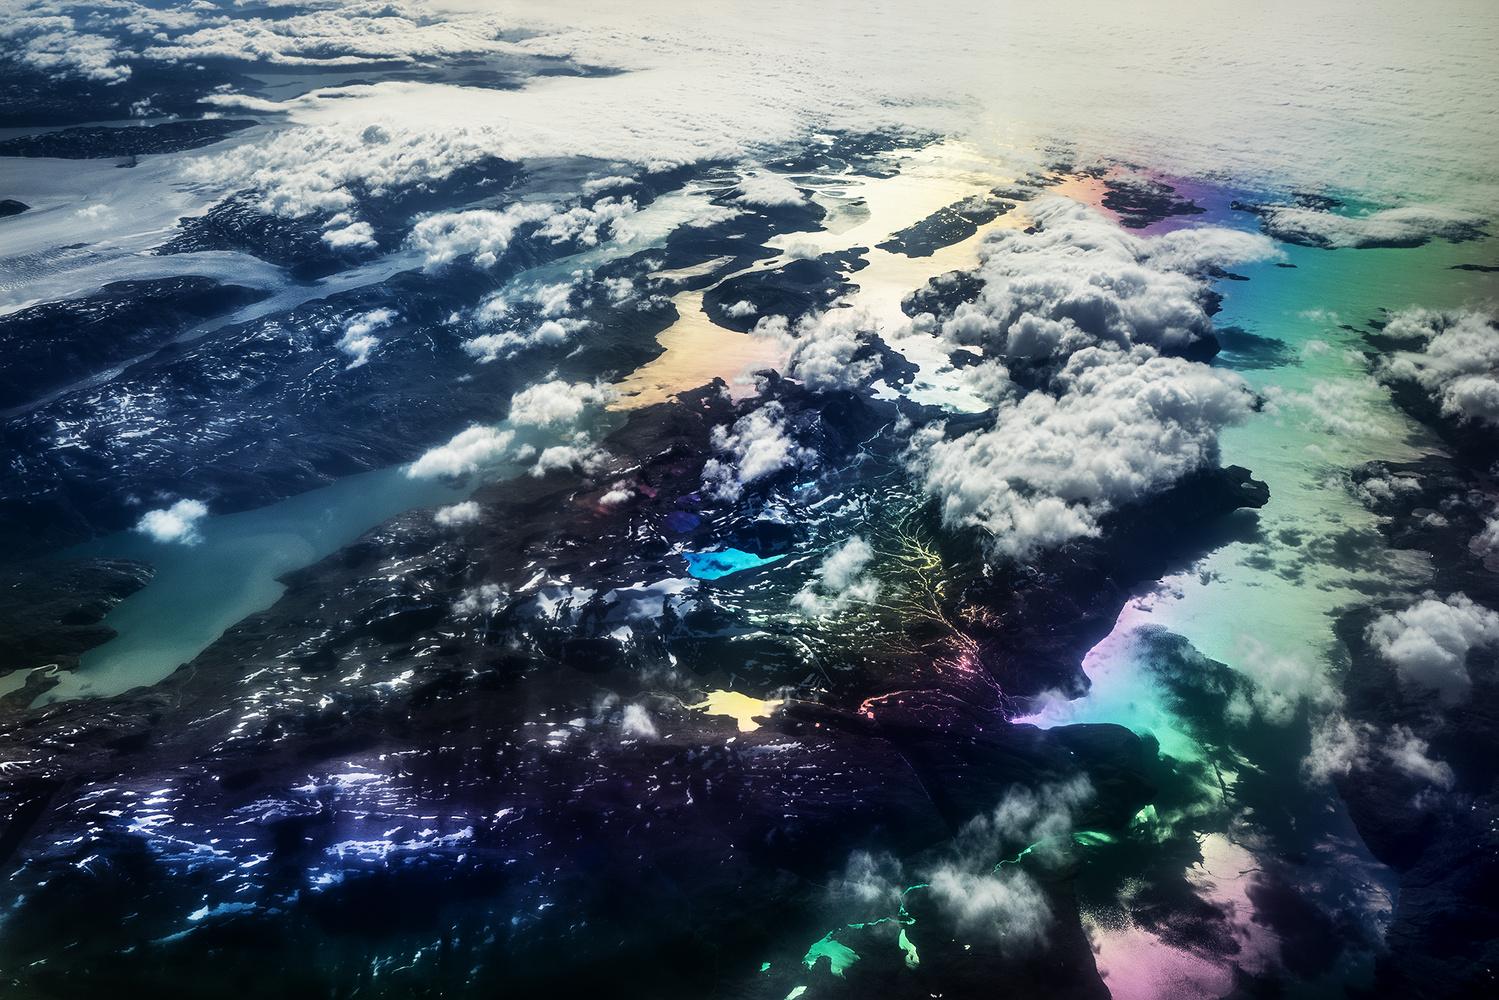 Greenland Rainbow by Marek Stefech